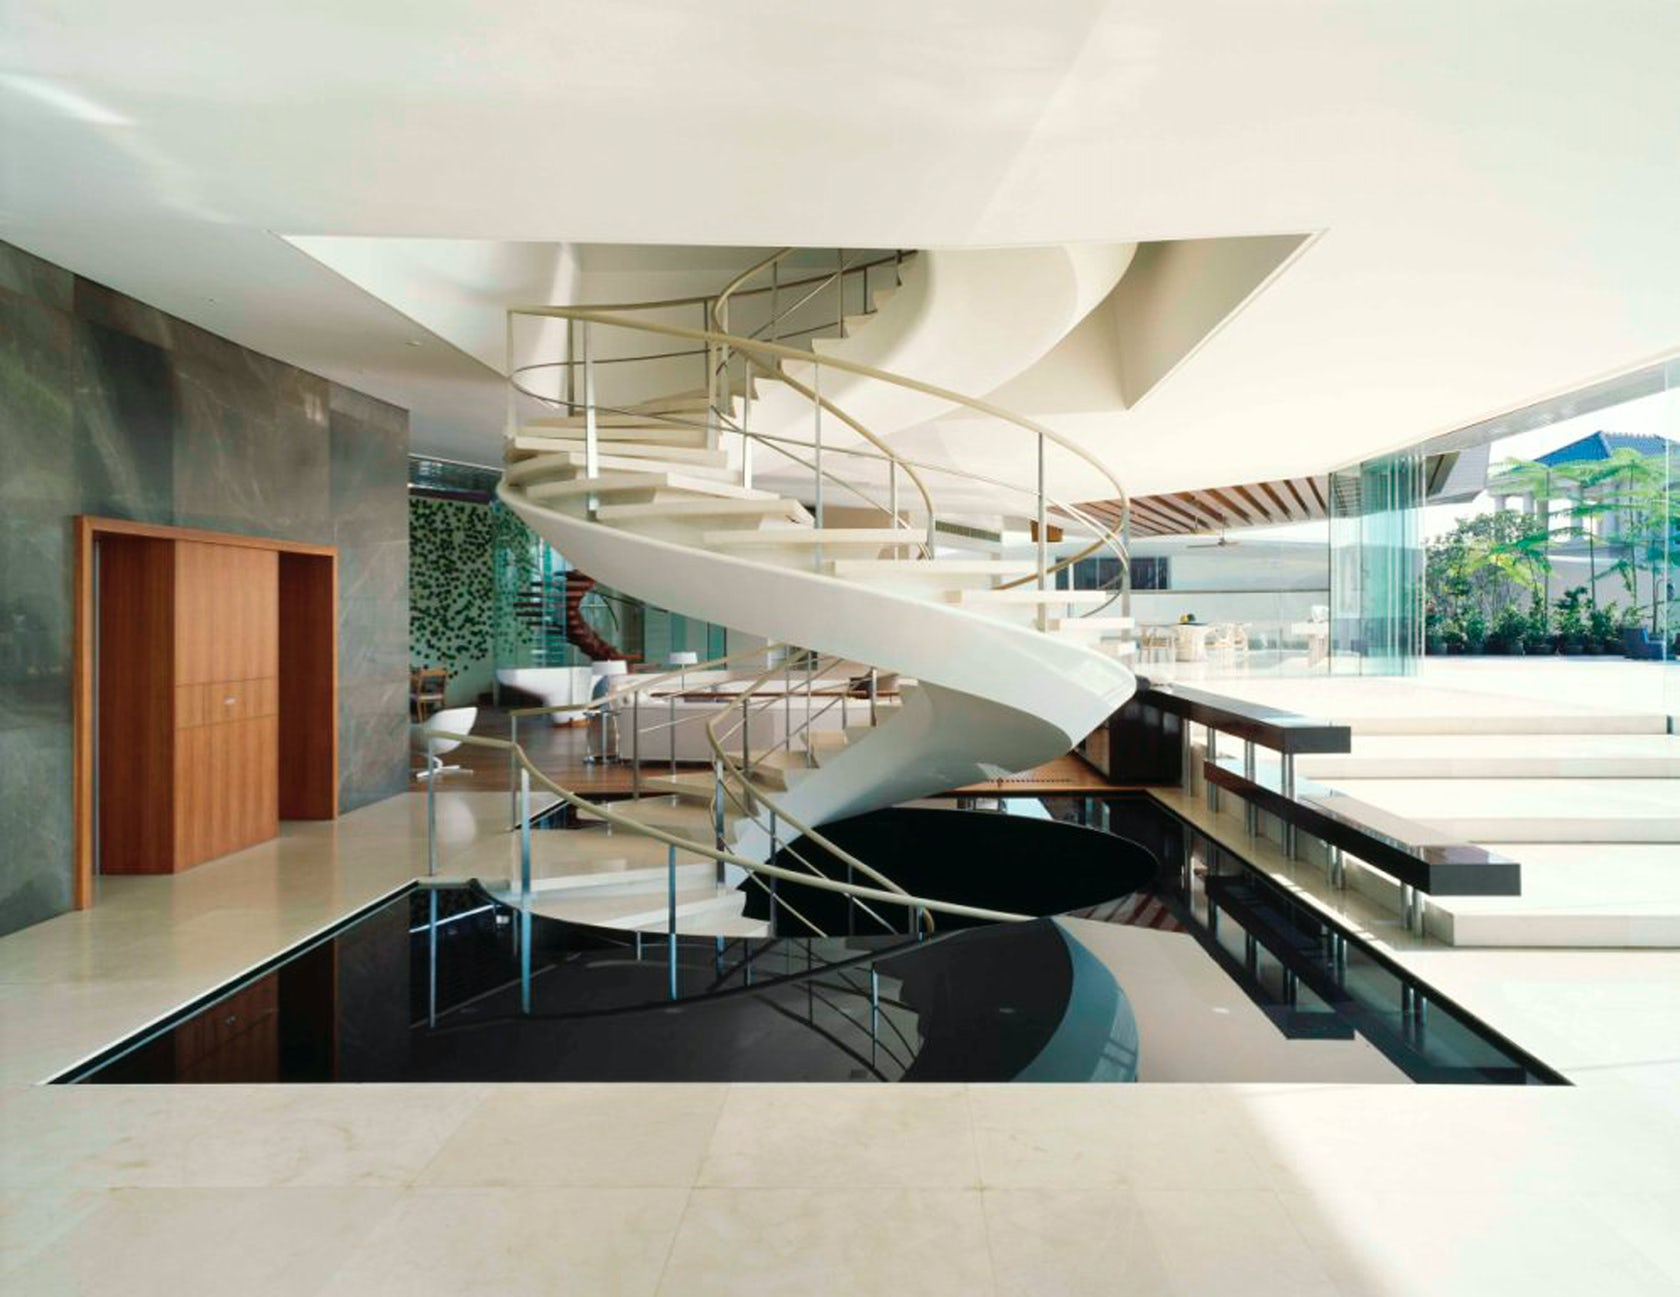 Ytl Residence On Architizer